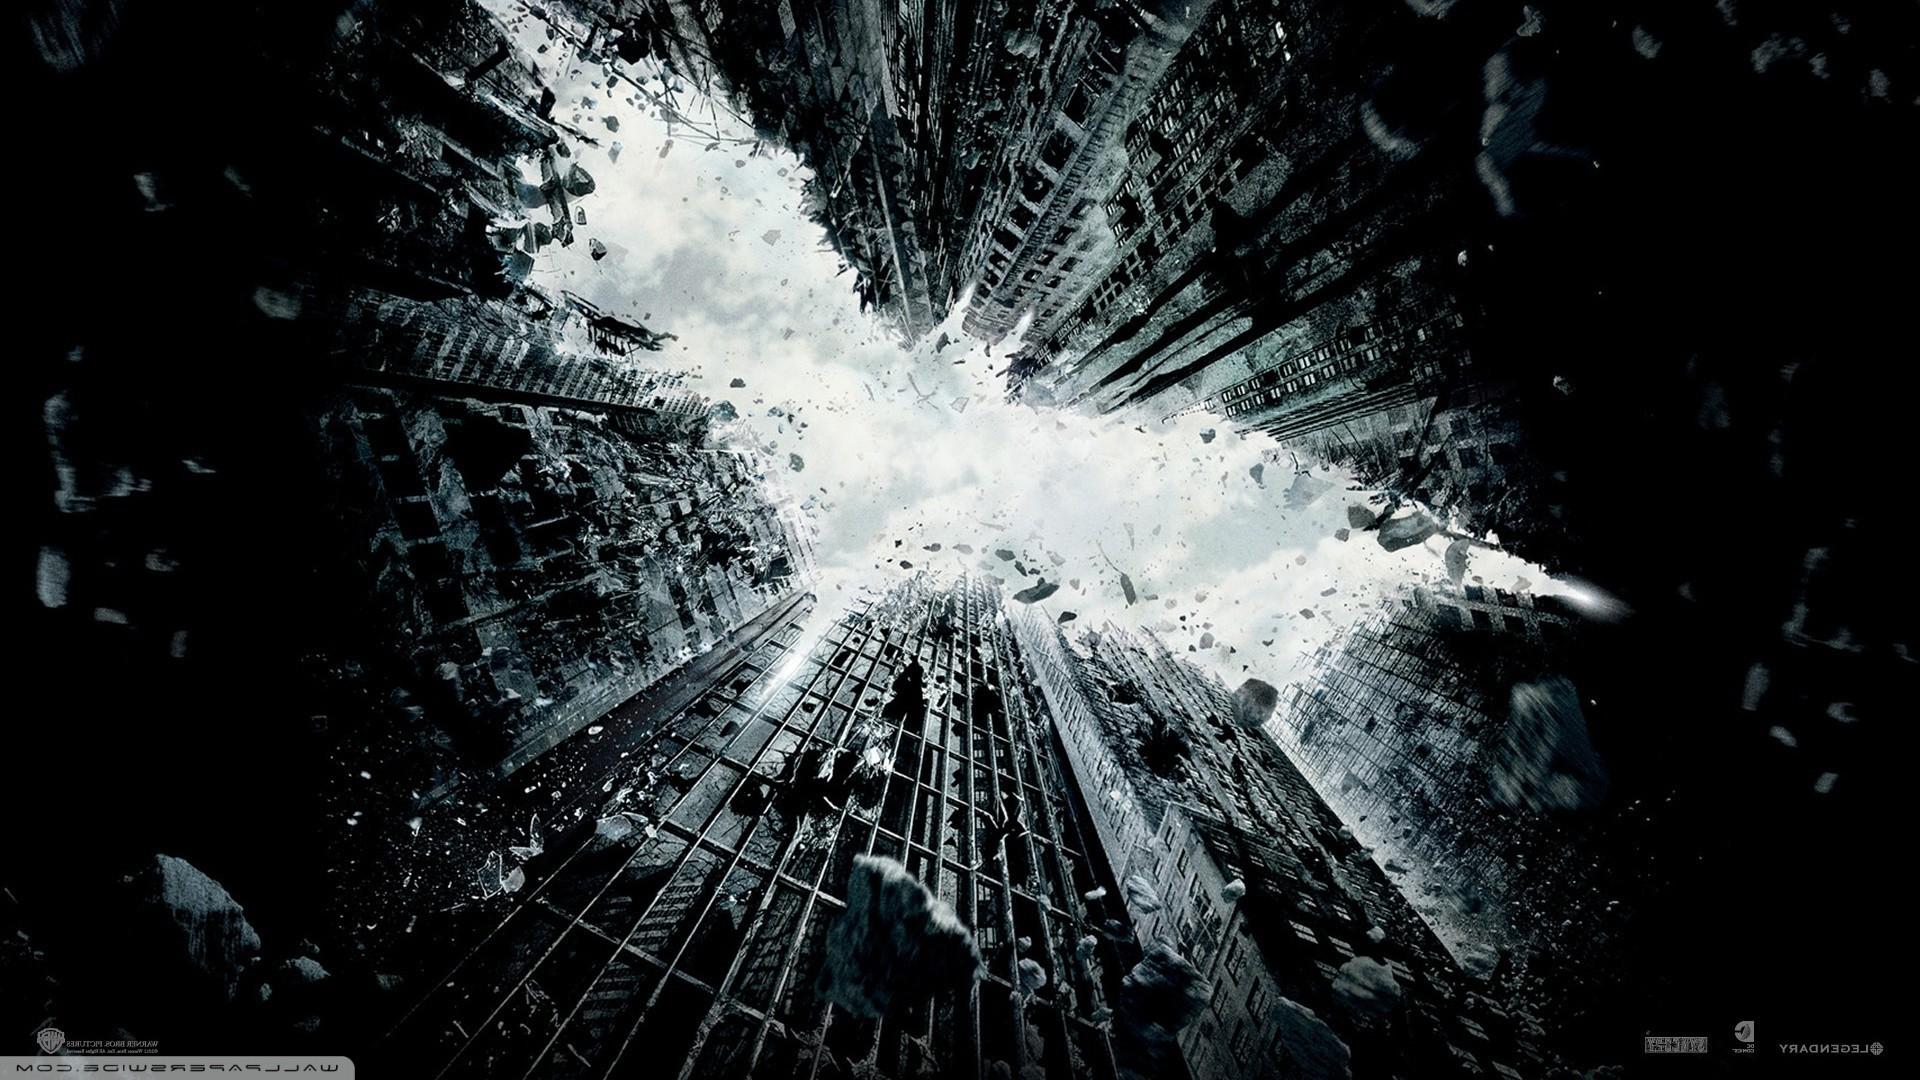 PreviousNext. Previous Image Next Image. batman begins wallpaper …